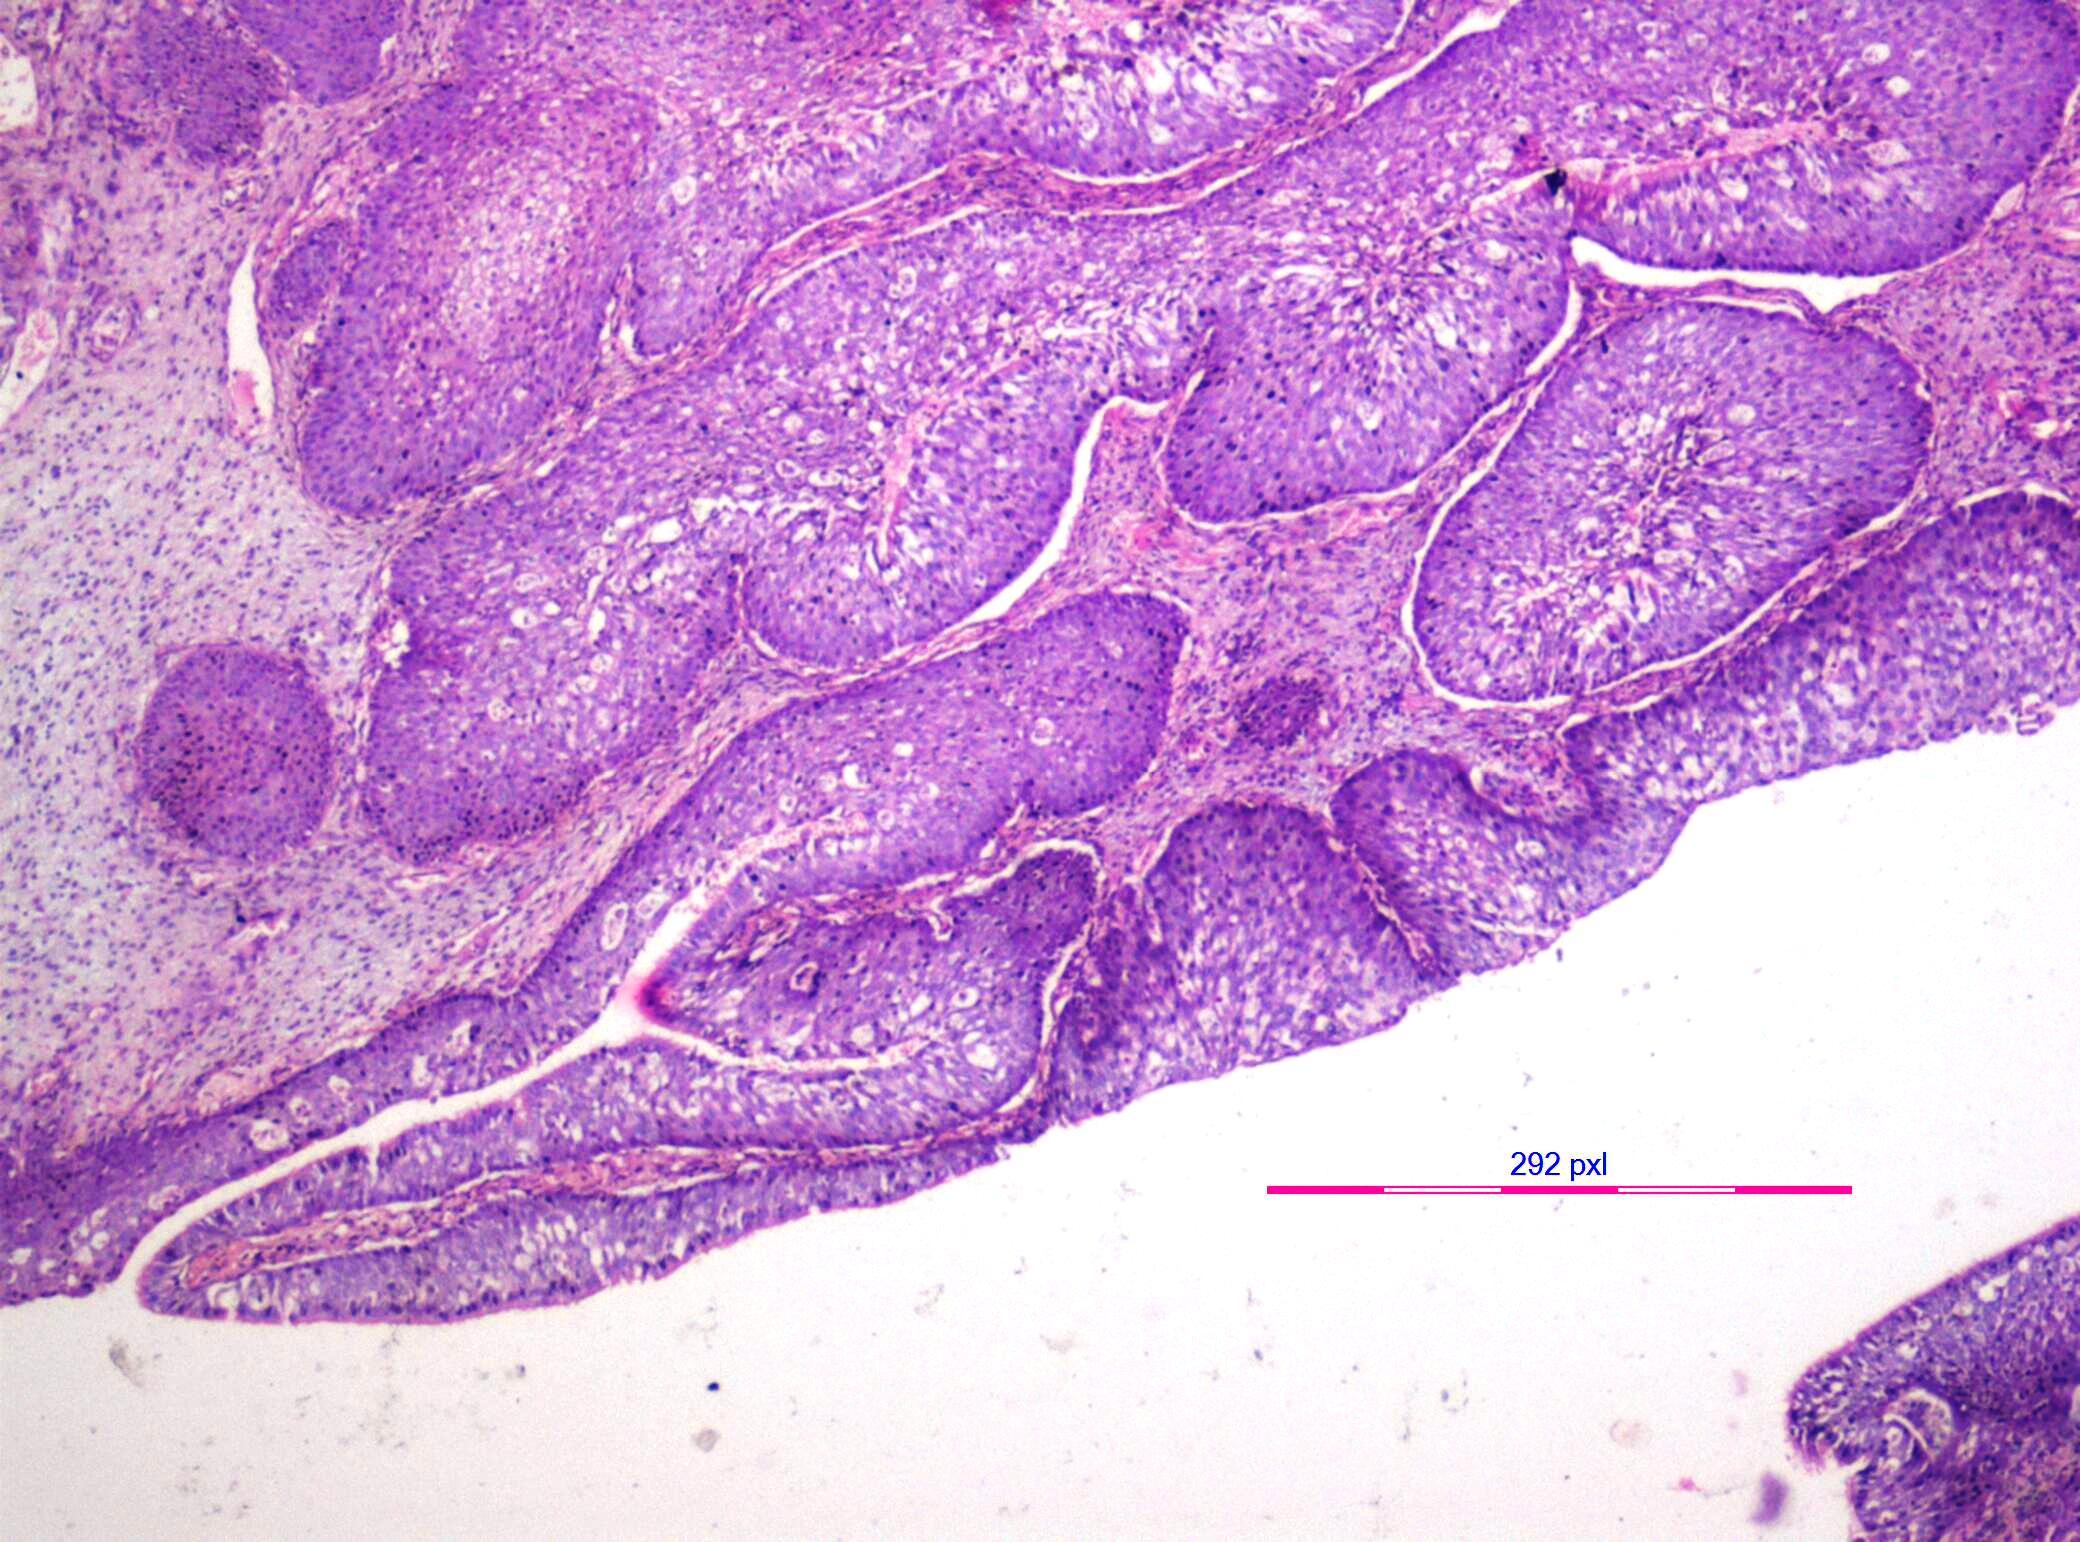 schneiderian papilloma malignant